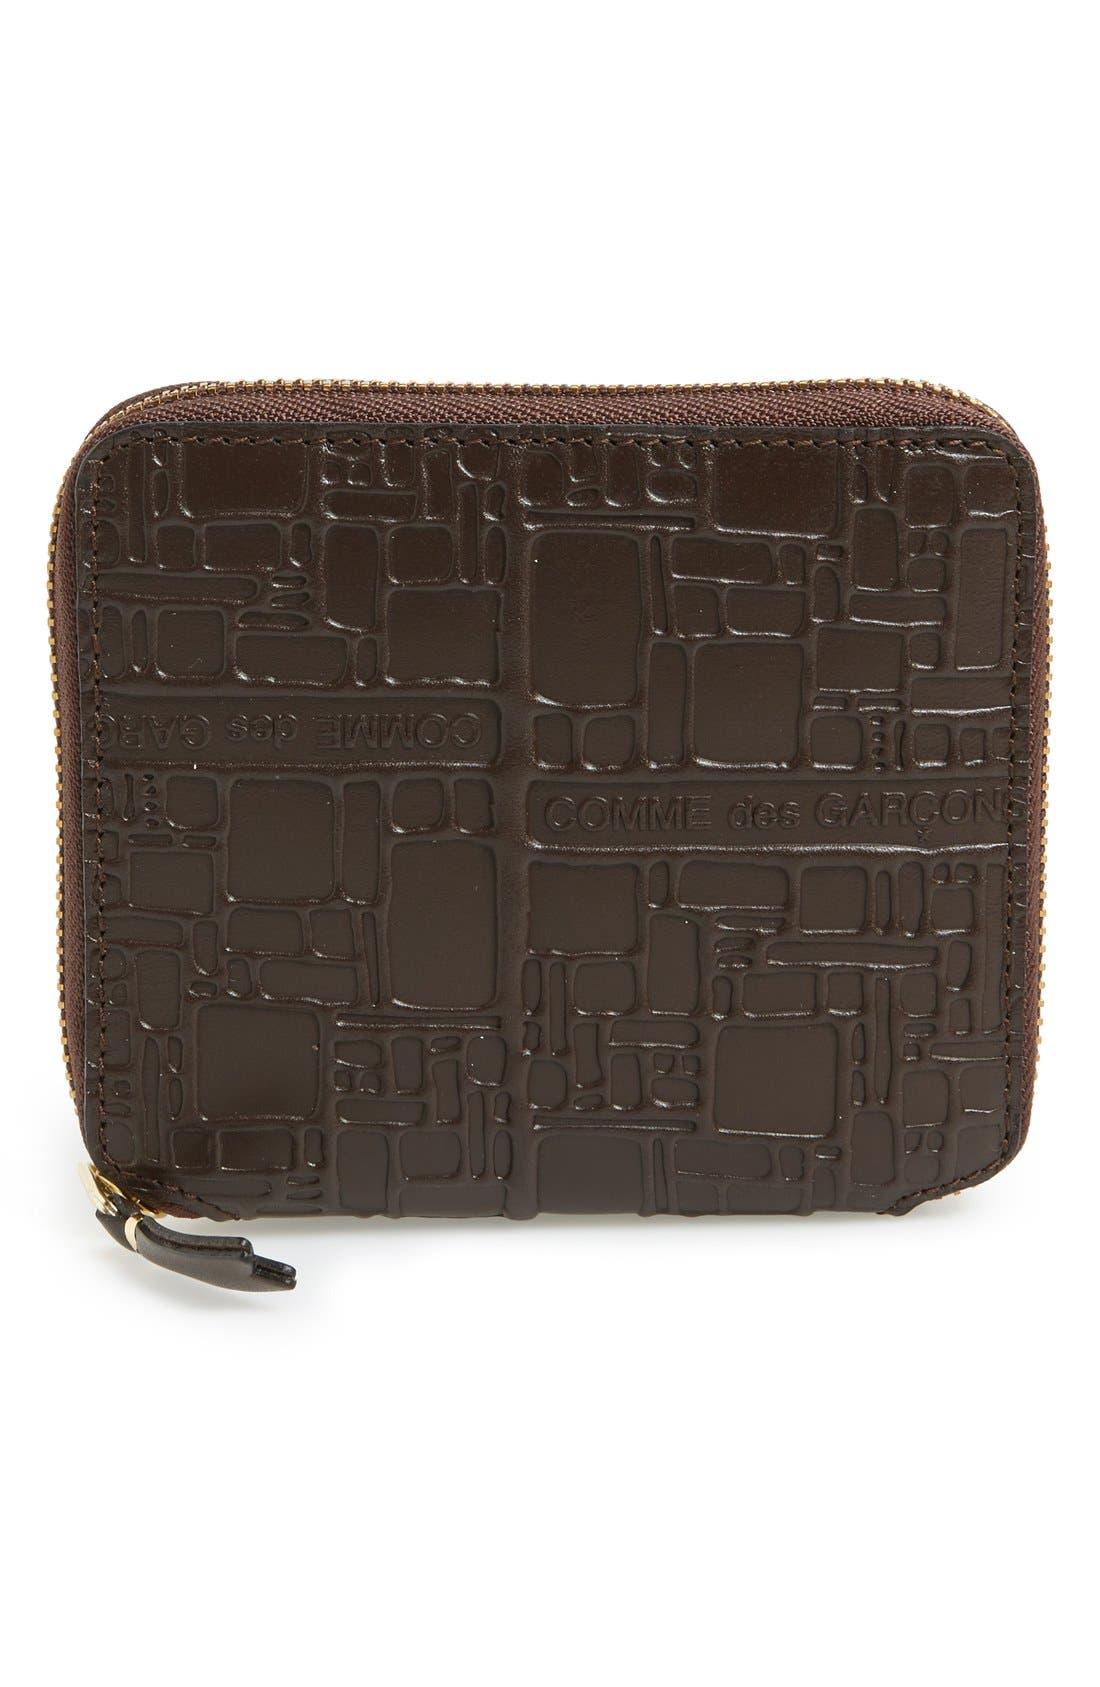 Main Image - Comme de Garçons Embossed French Wallet